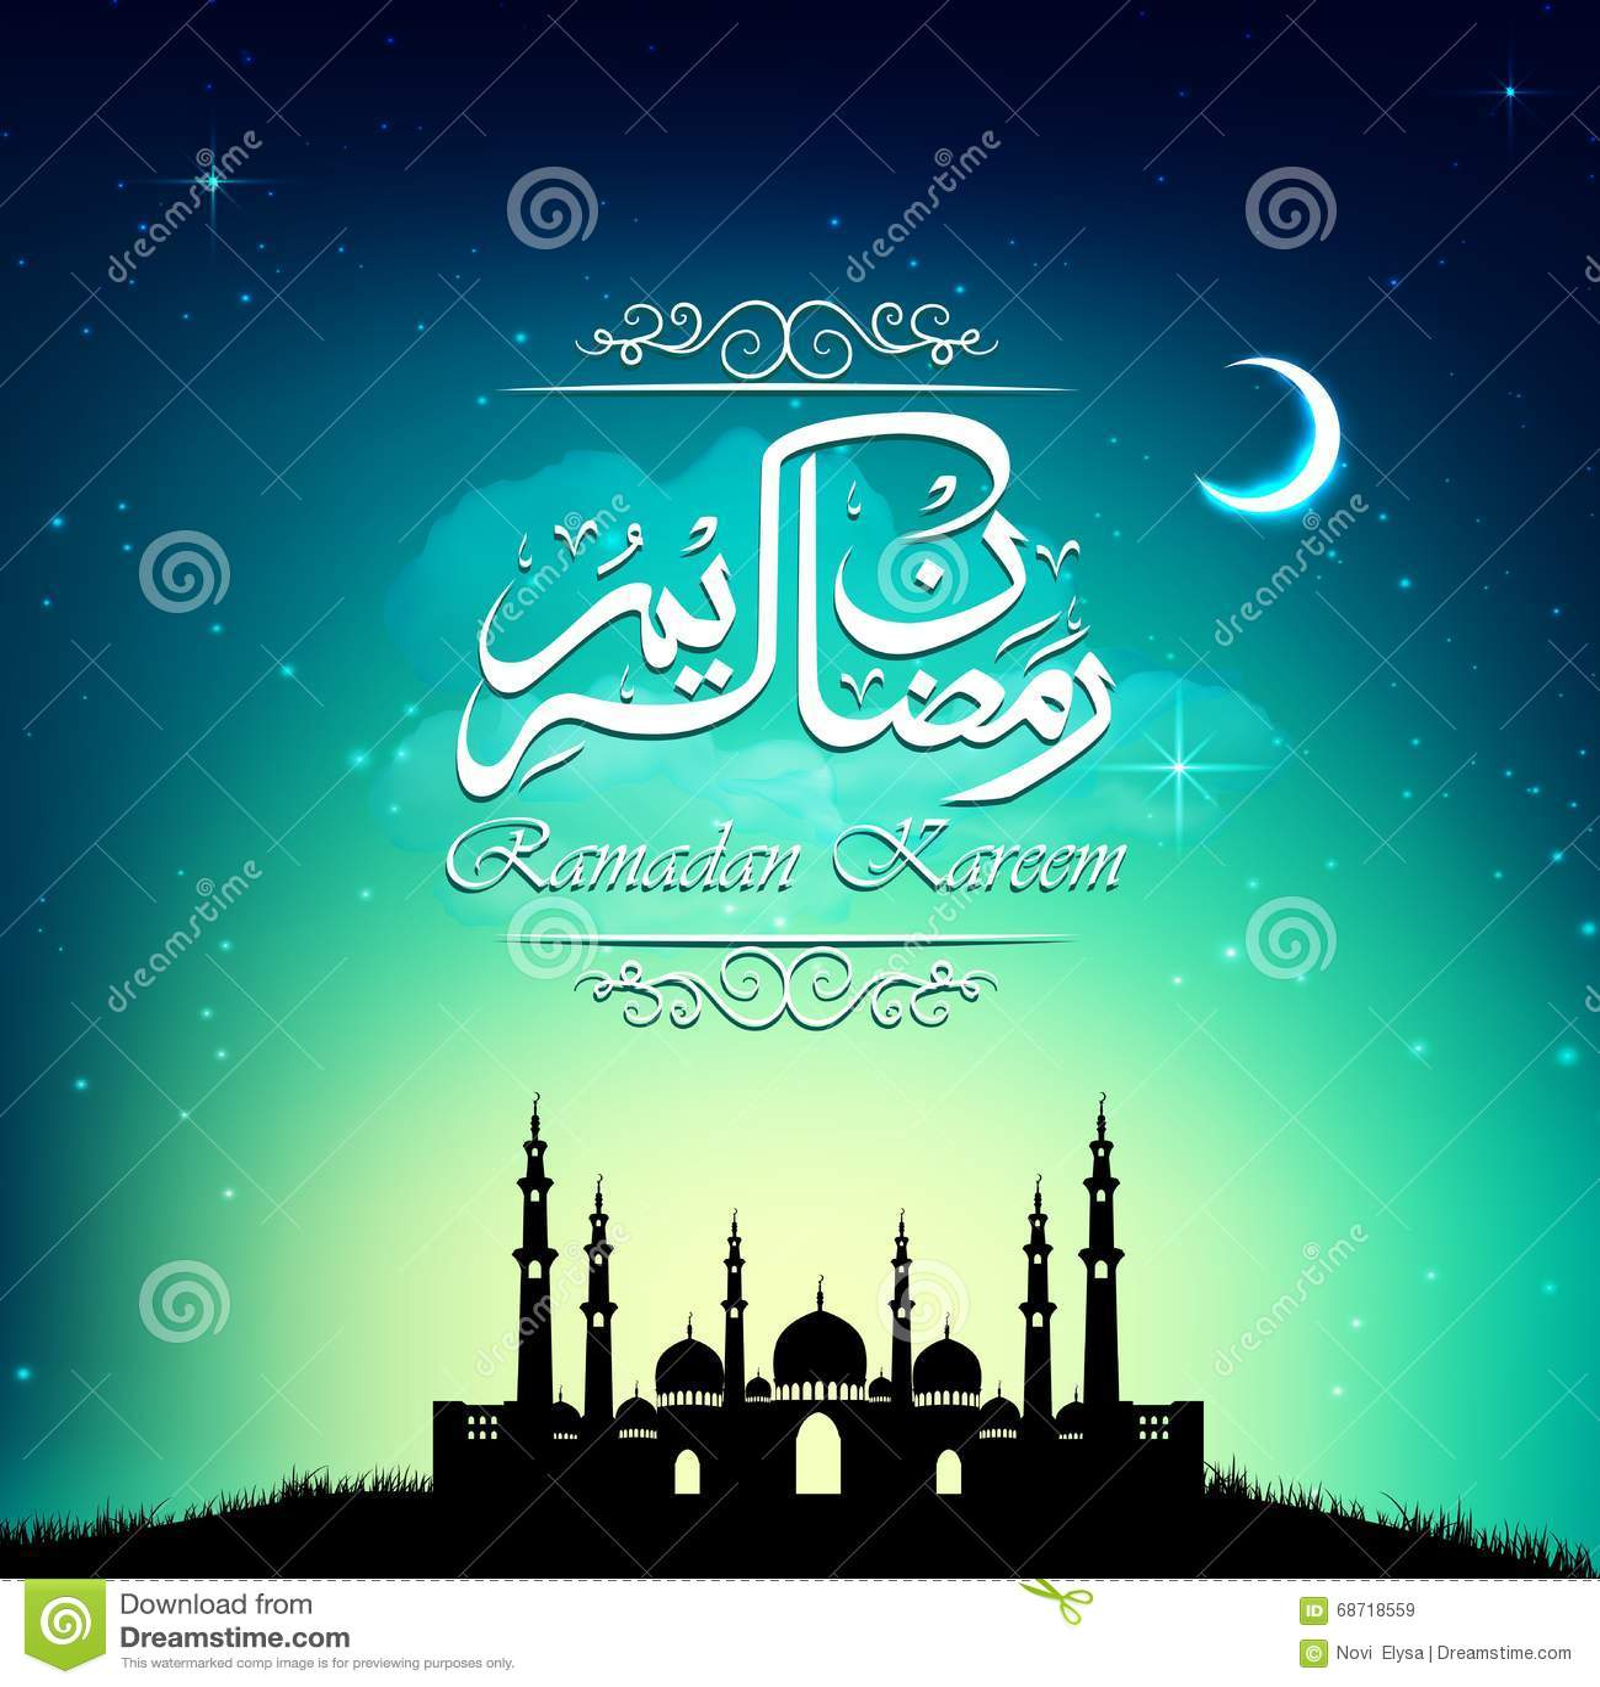 Mosque background for ramadan kareem stock photography image - Background Glowing Illustration Kareem Mosque Ramadan